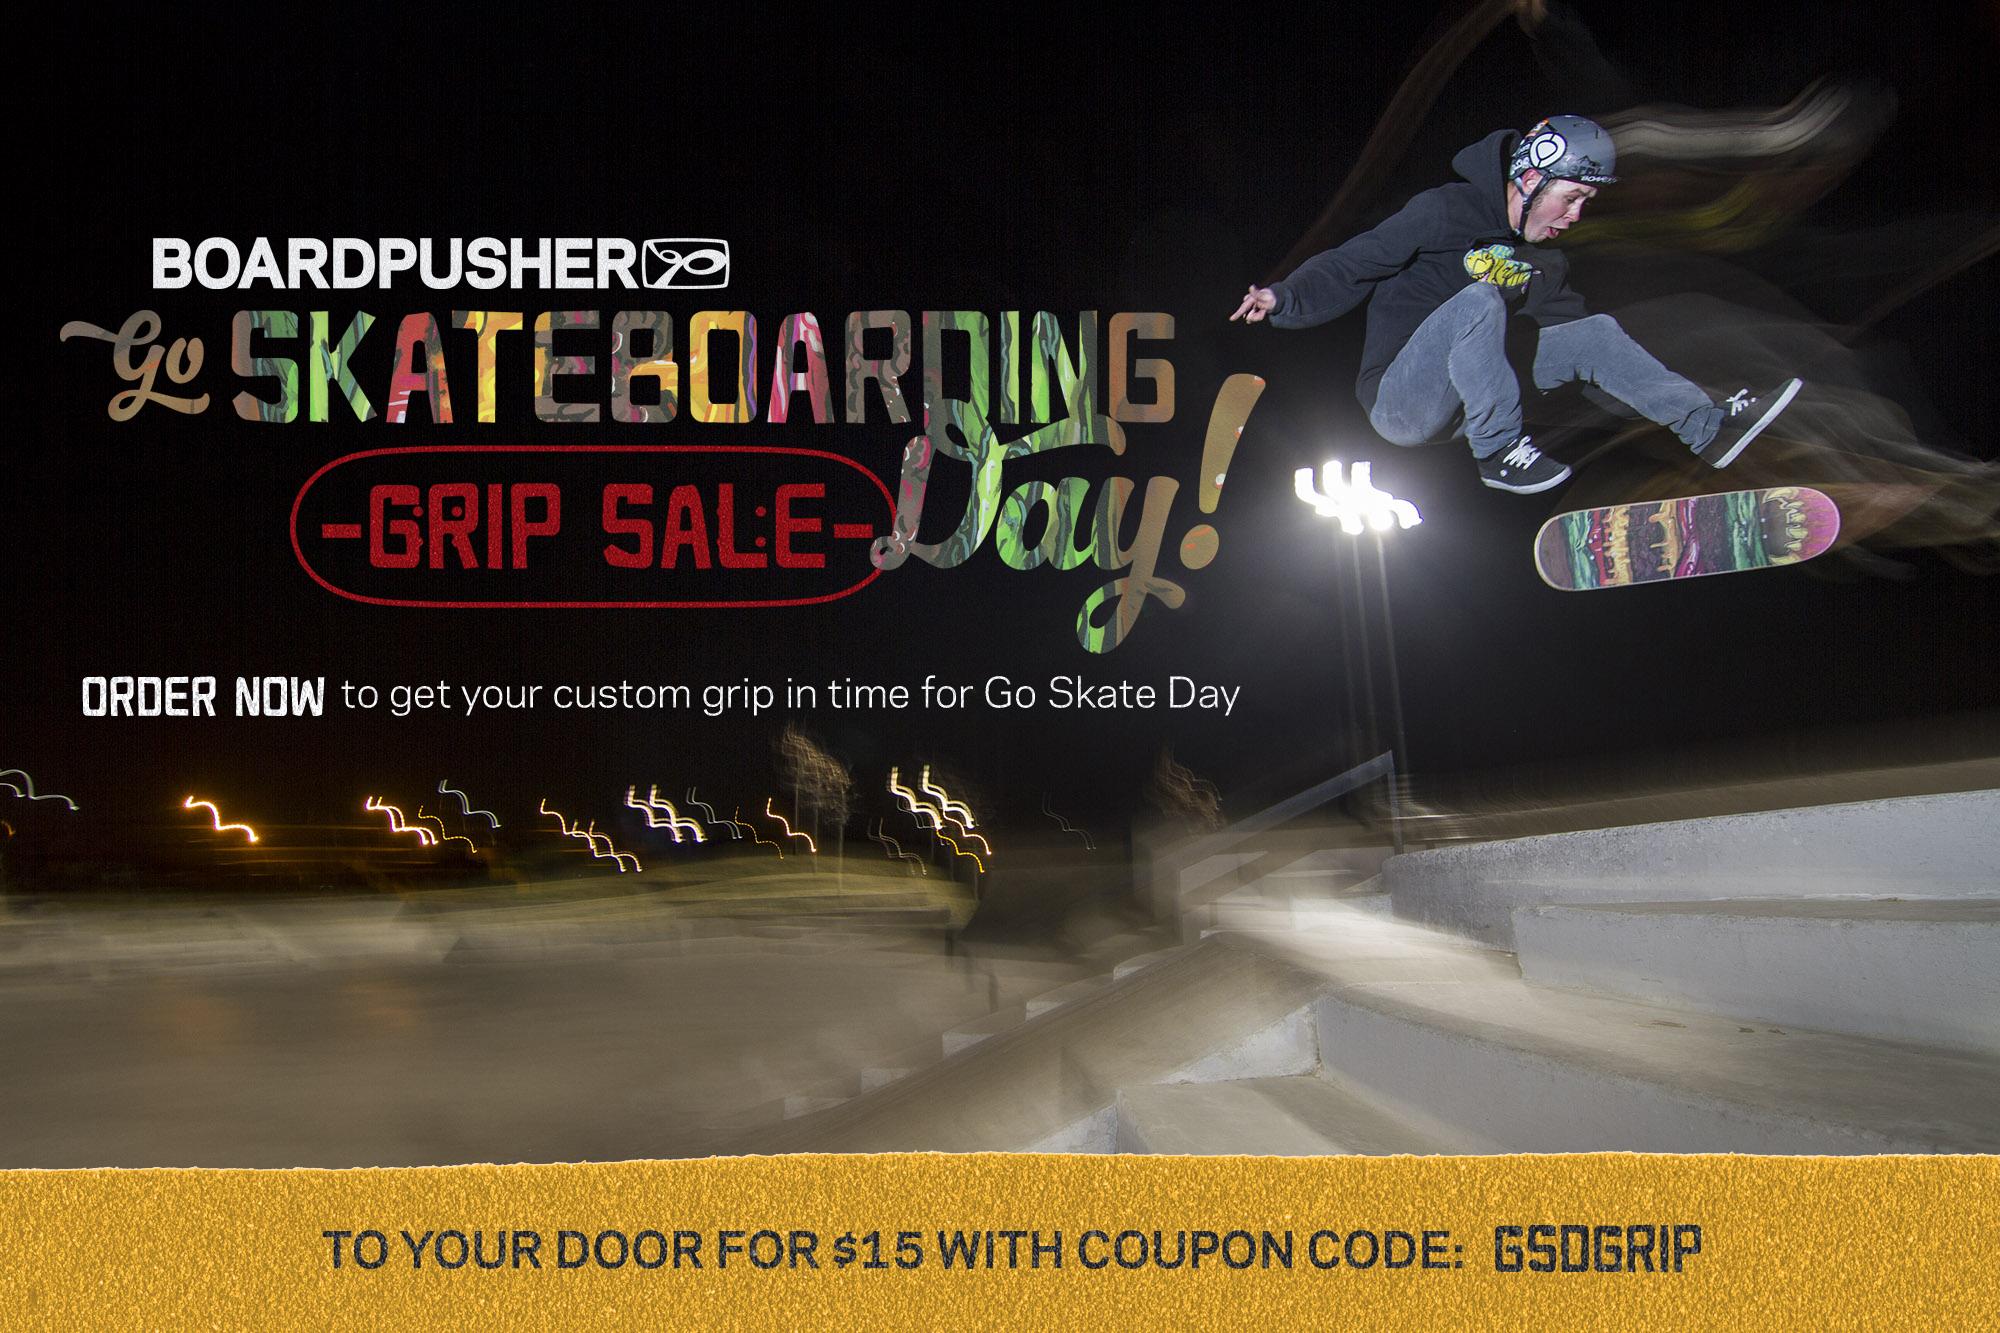 Boardpusher_go_skate_day_grip_image.jpg